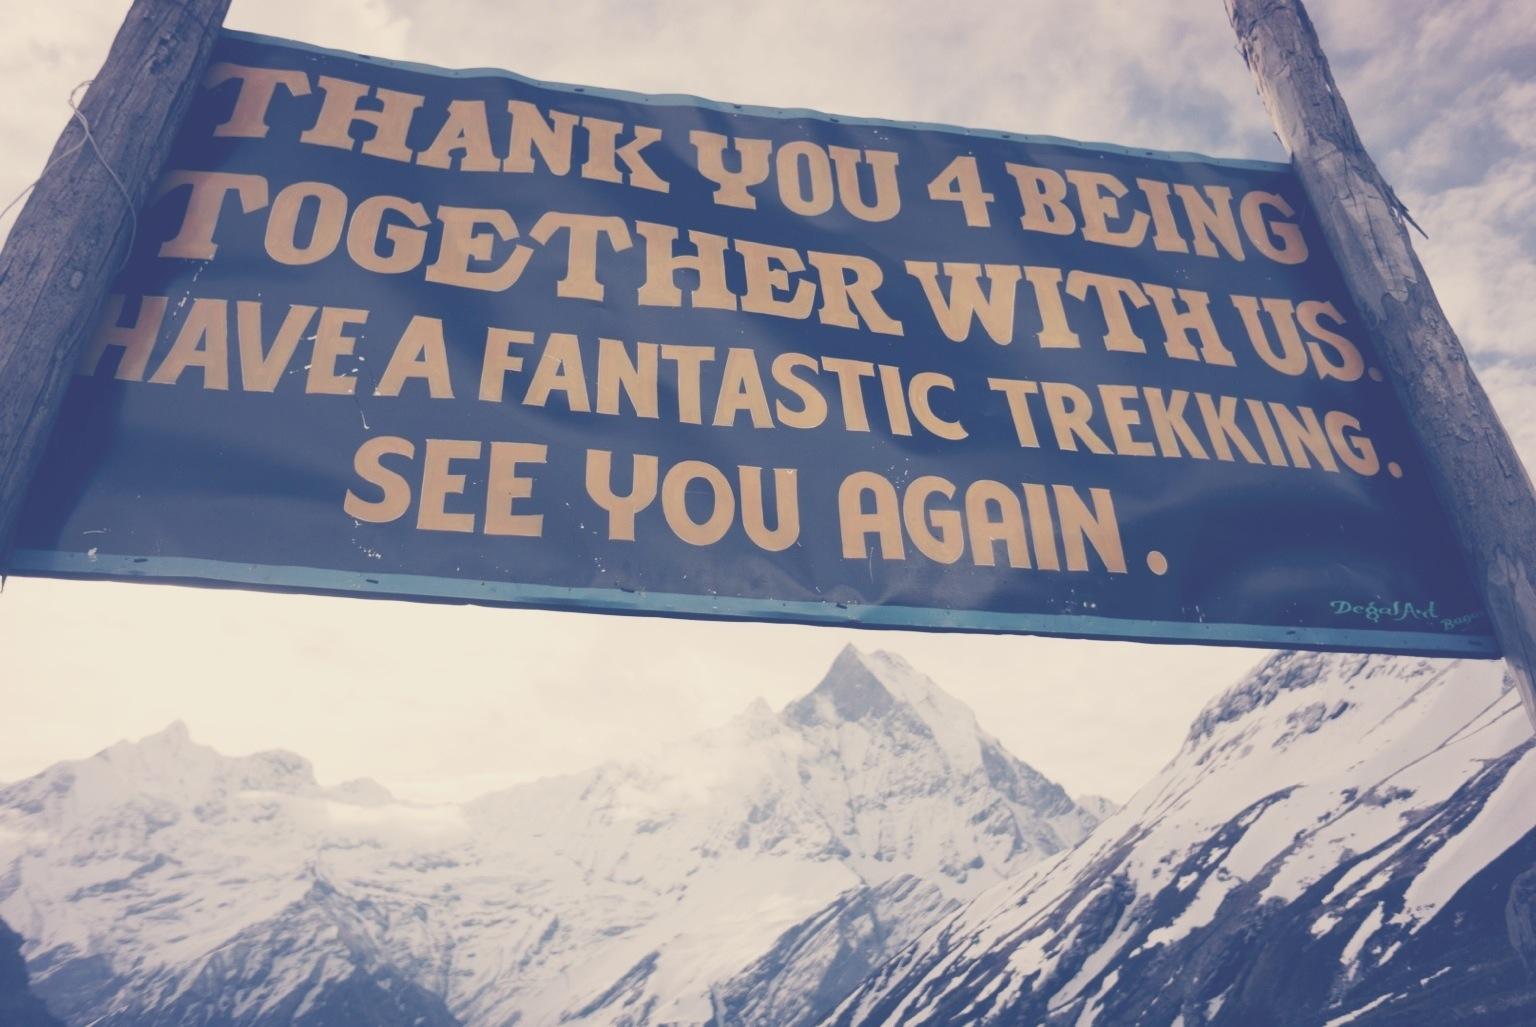 Have a fantastic trekking, sign upon departure